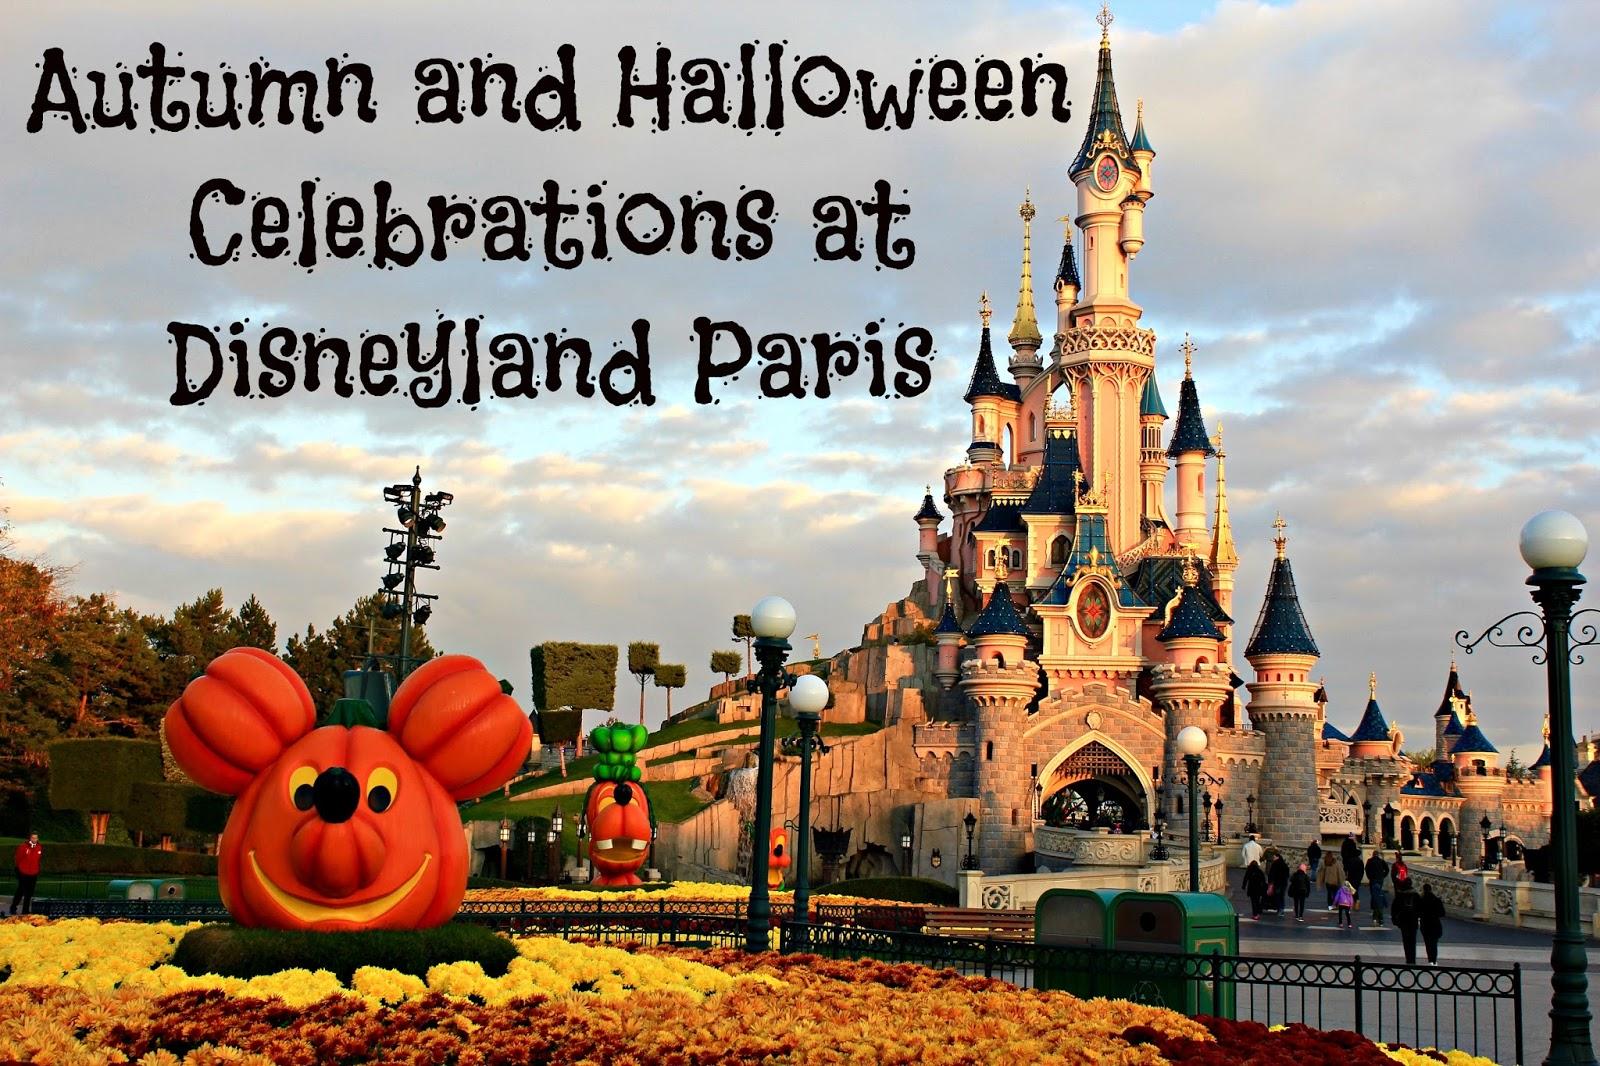 autumn and halloween celebrations at disneyland paris | shy, strange